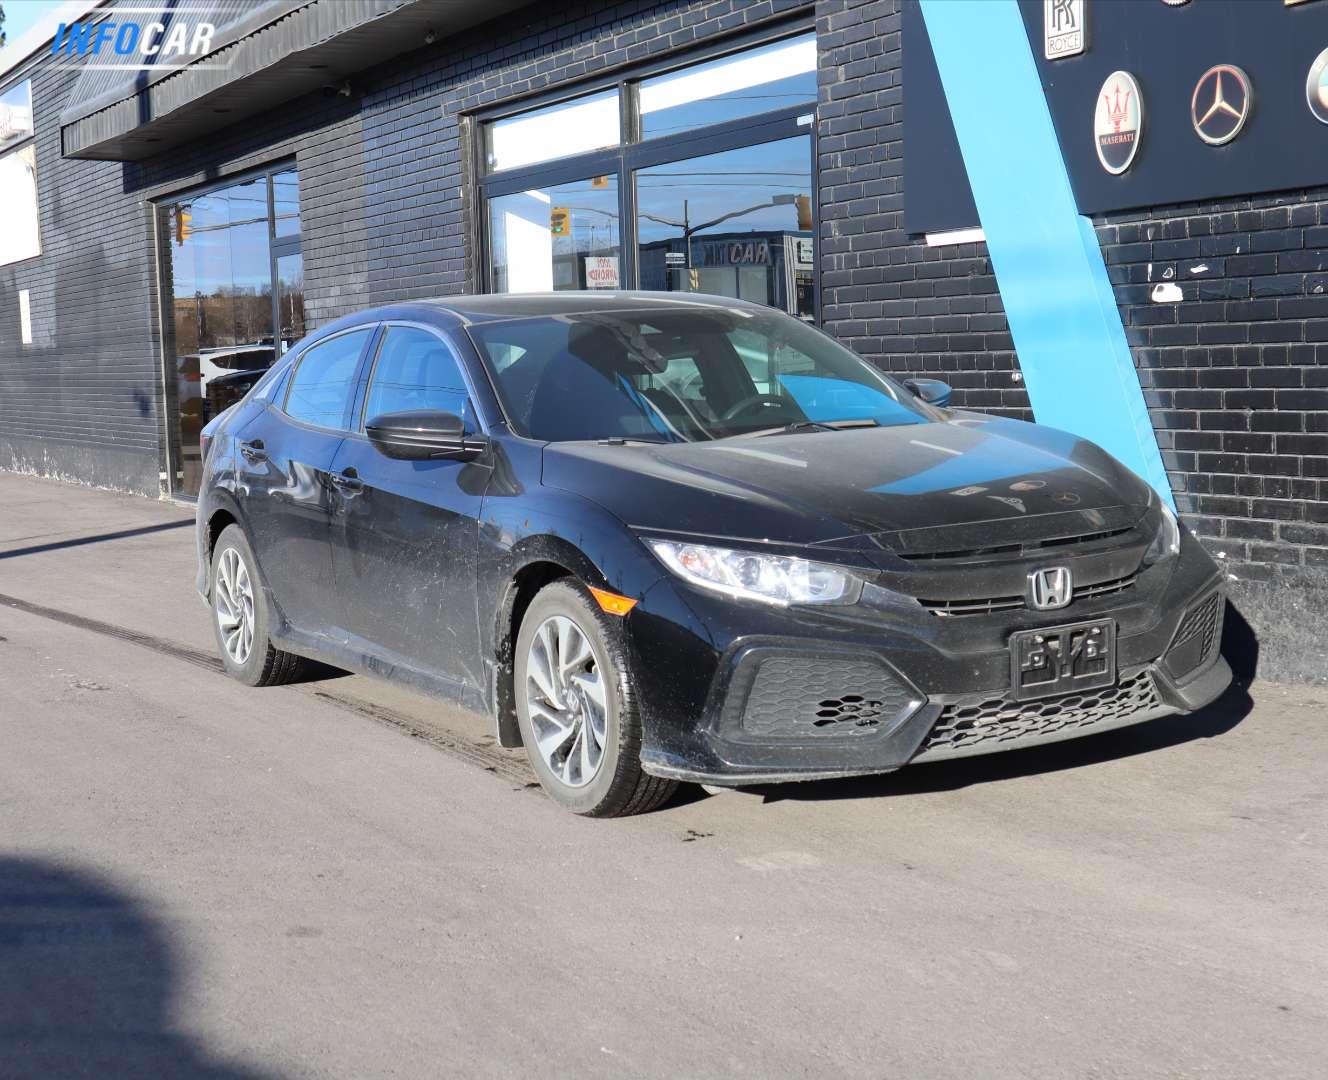 2019 Honda Civic HATCHBACK - INFOCAR - Toronto's Most Comprehensive New and Used Auto Trading Platform